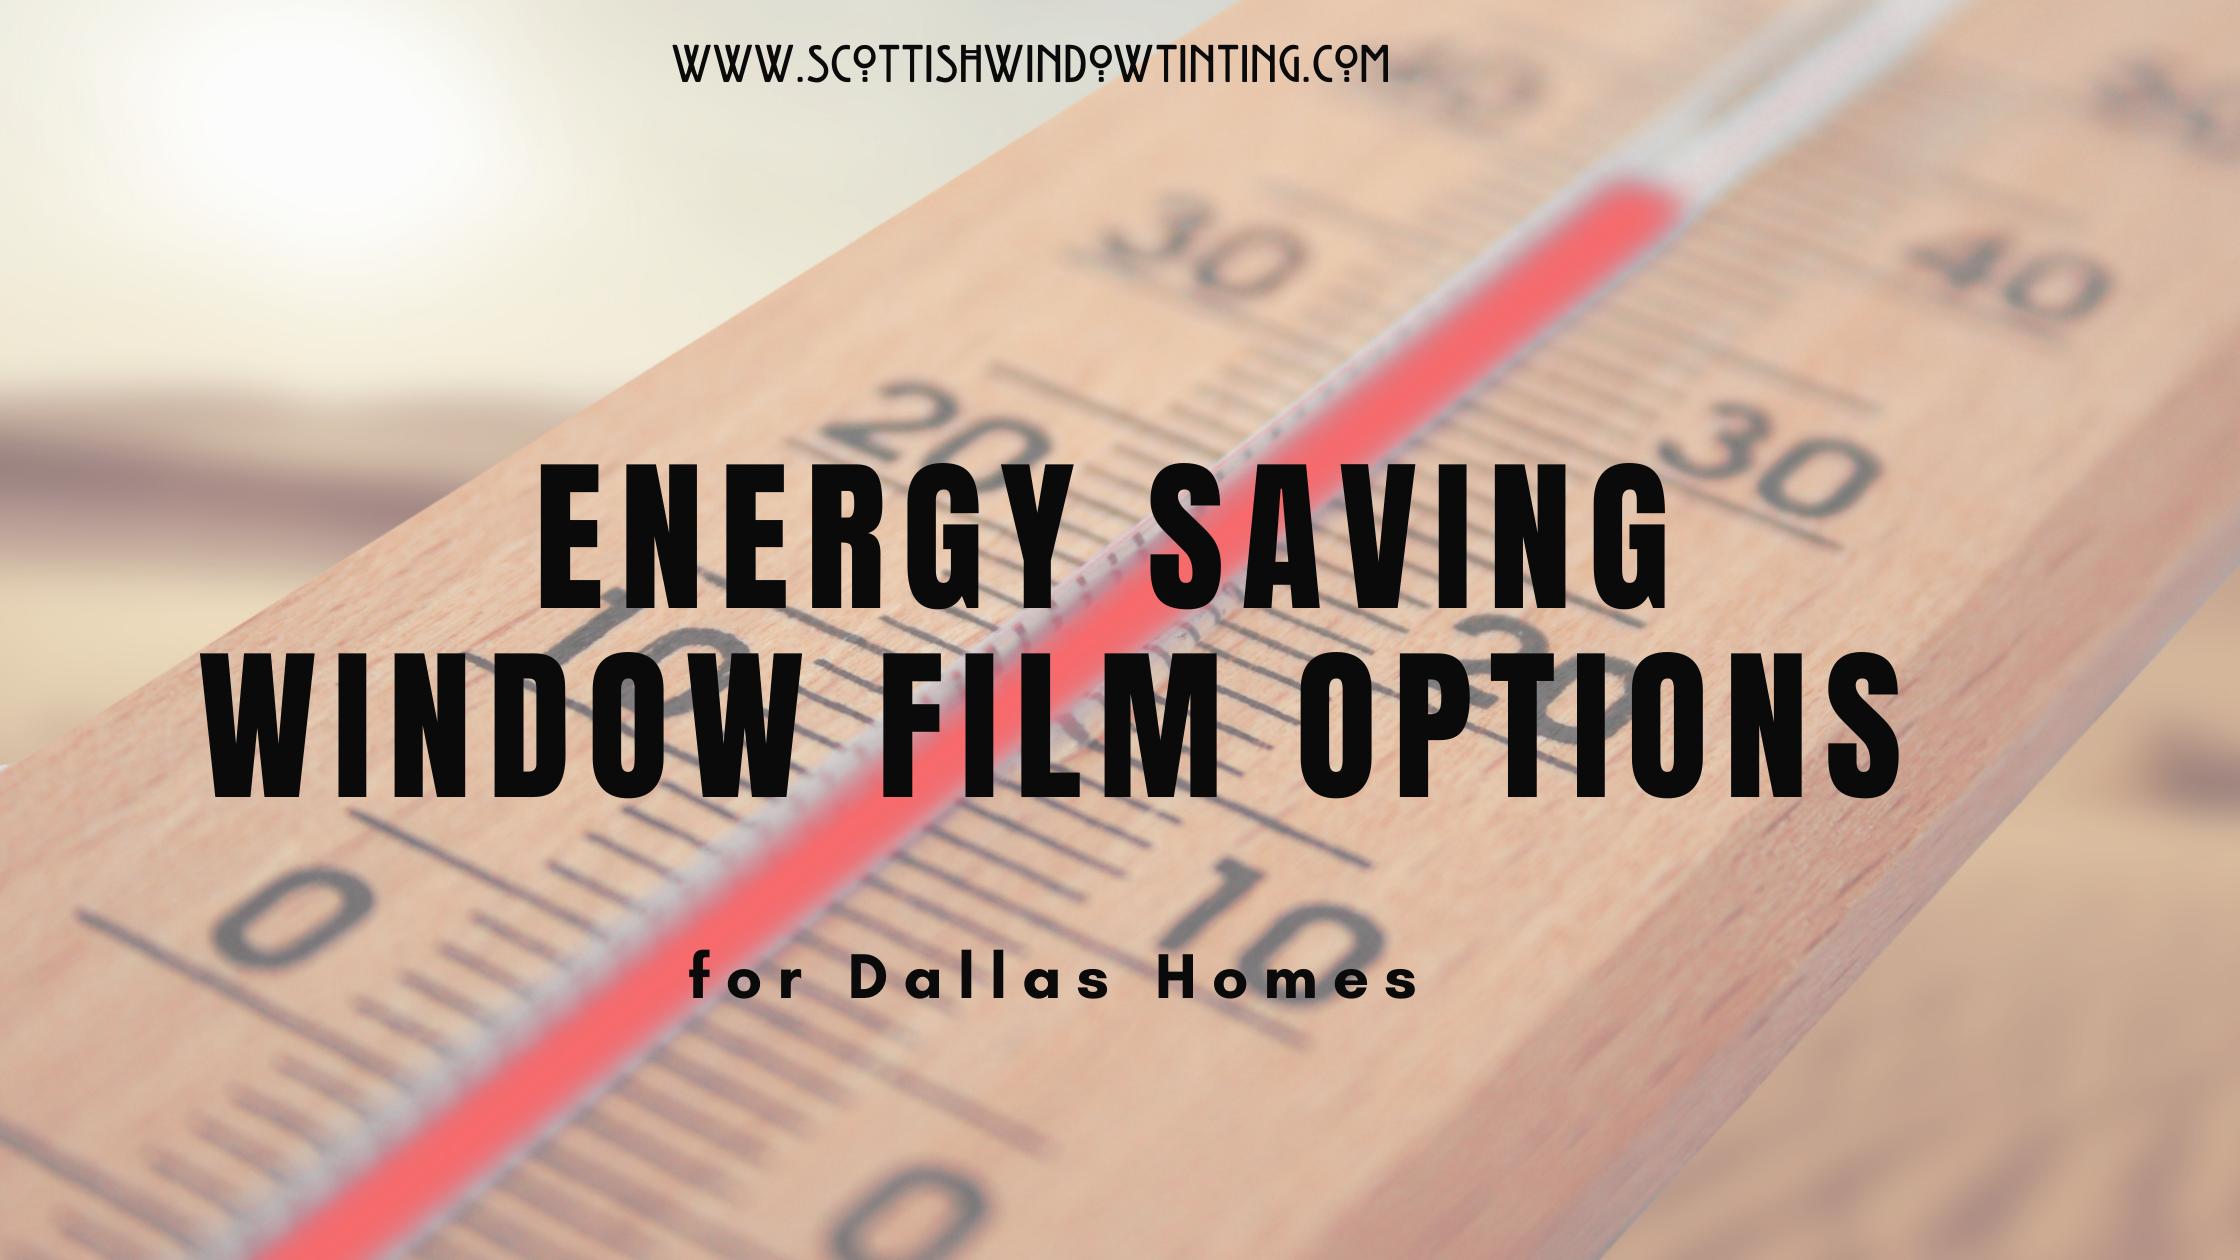 Energy Saving Window Film Options for Dallas Homes